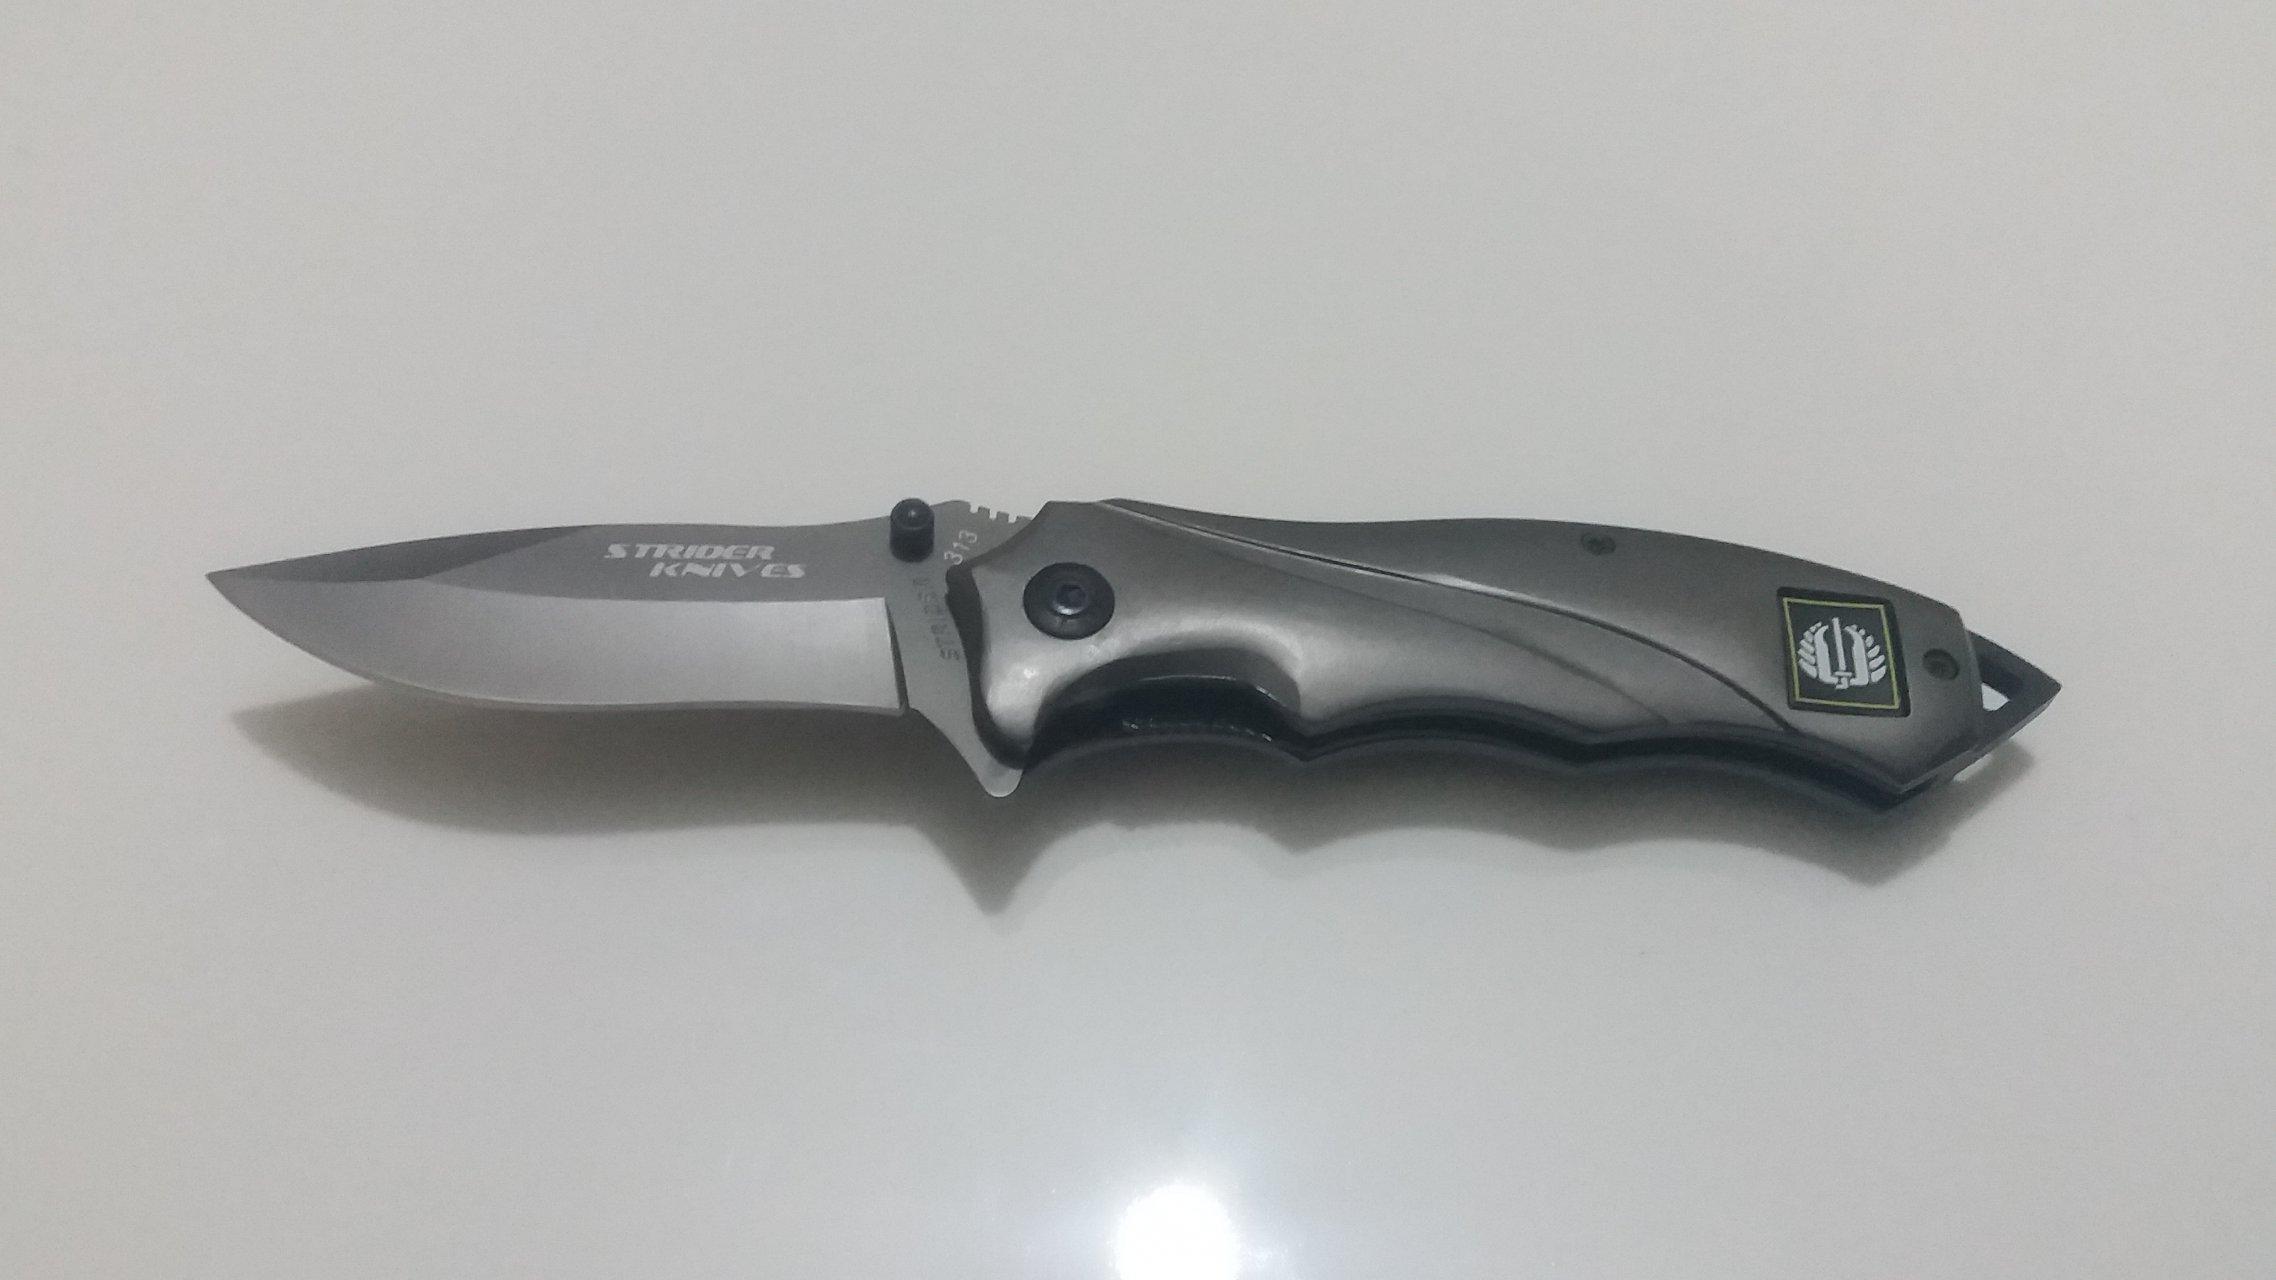 چاقوی سفری مدل شکاری strider 313